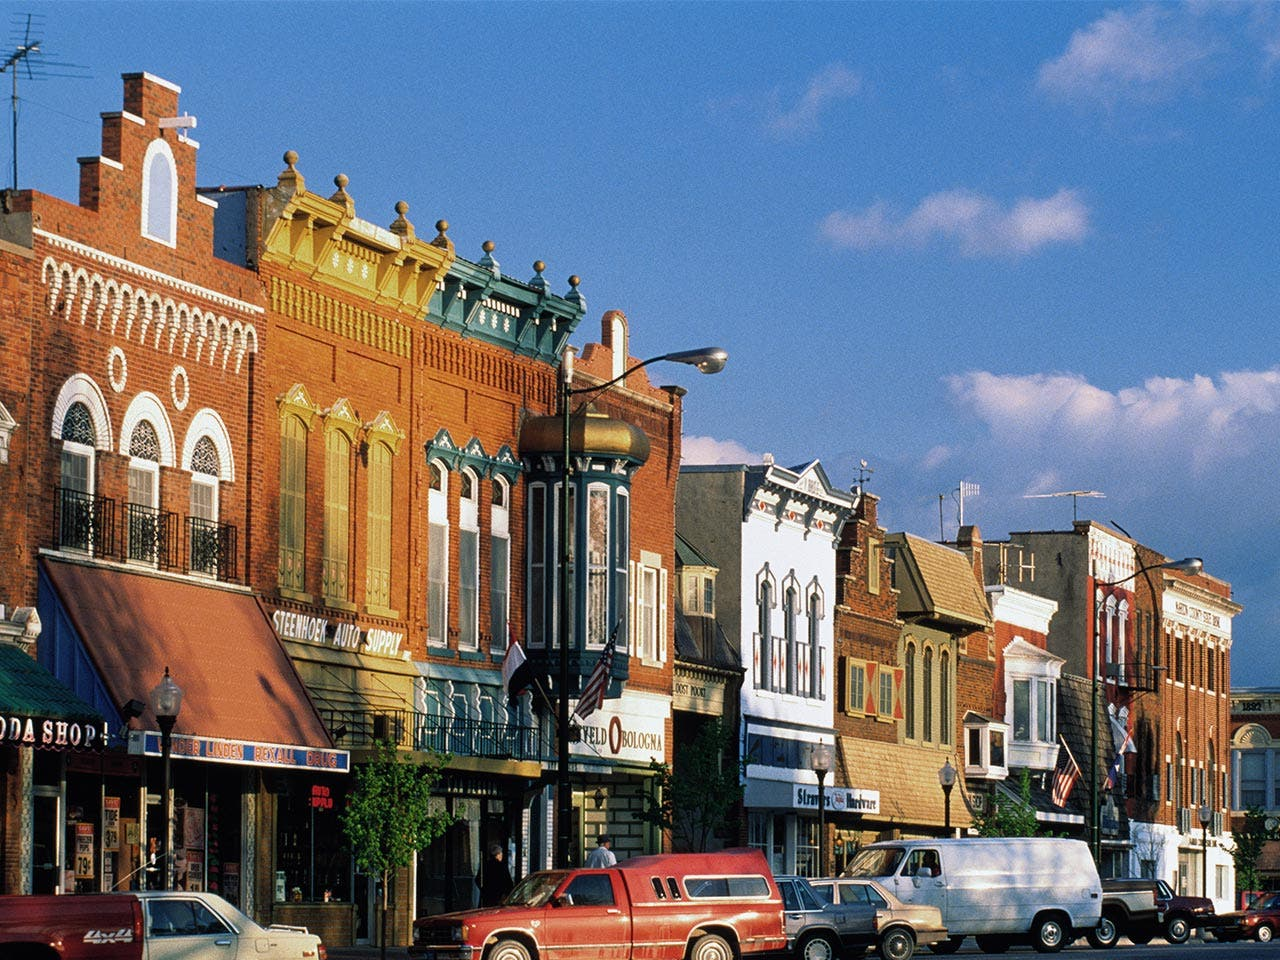 Busy main street in Iowa